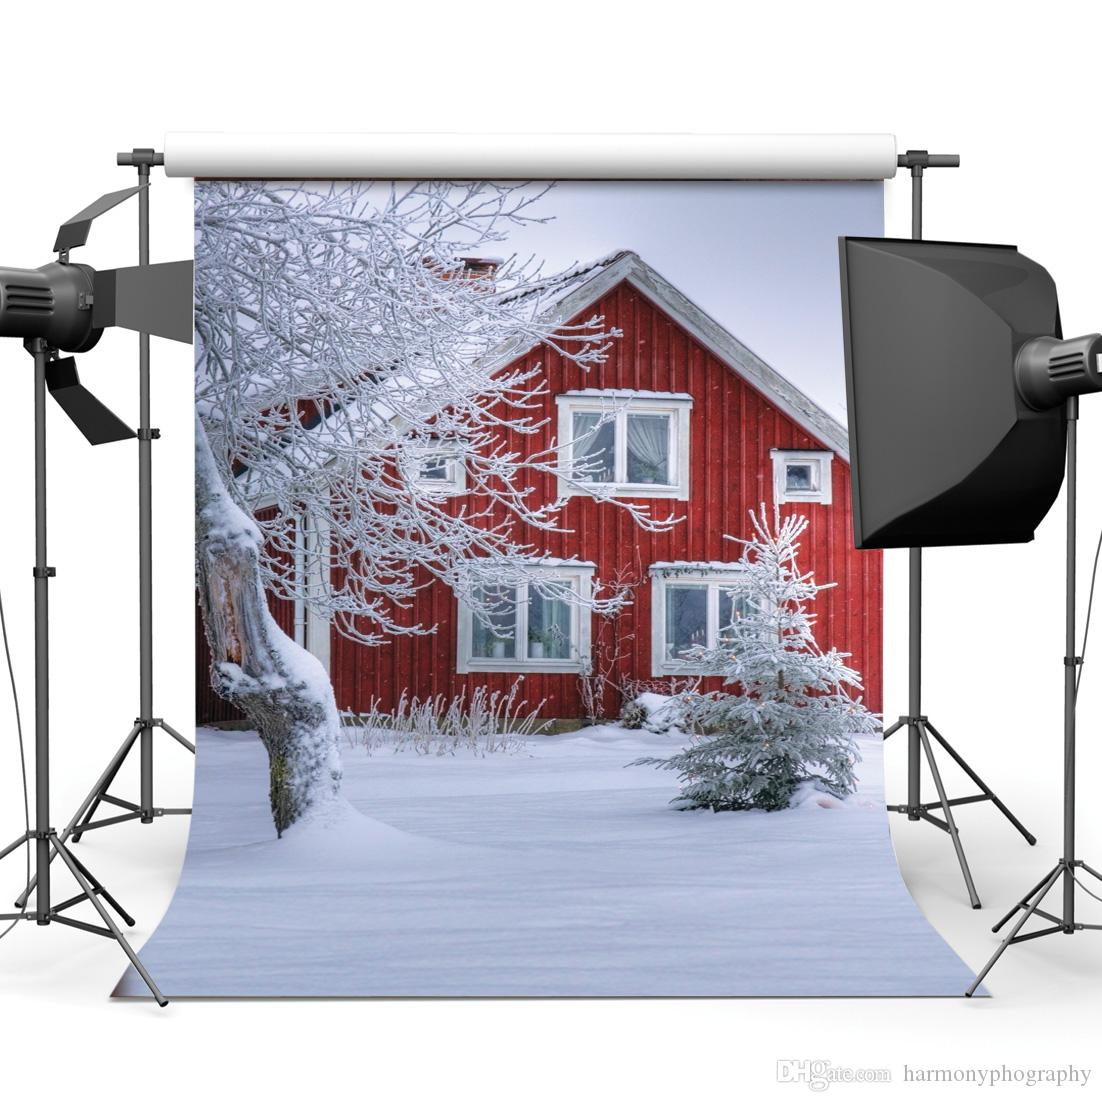 Christmas 5X7ft camera fotografica backdrops vinyl cloth photography backgrounds wedding children baby backdrop for photo studio 10285